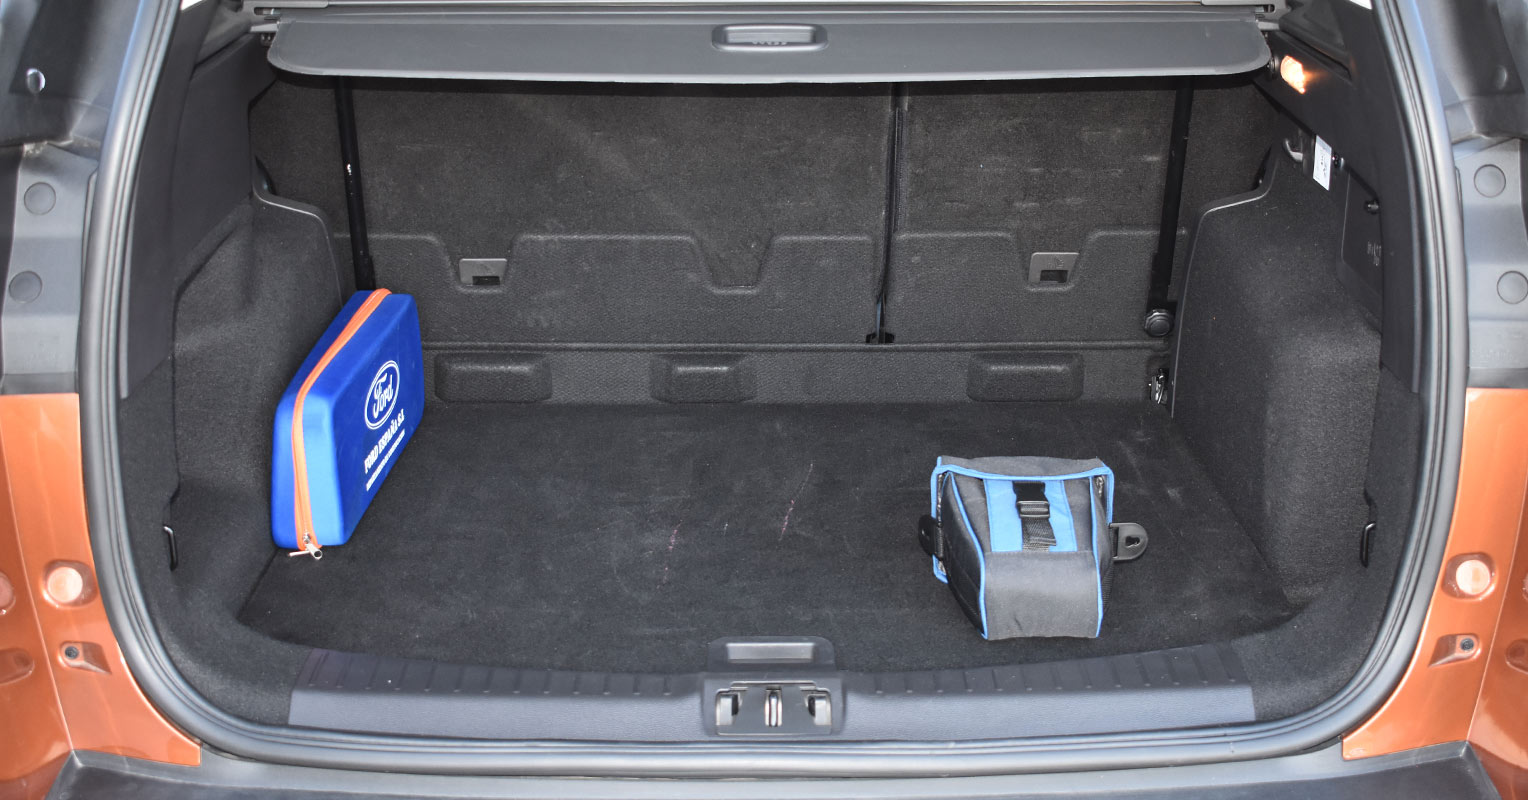 Maletero del Ford Kuga Titanium 2018